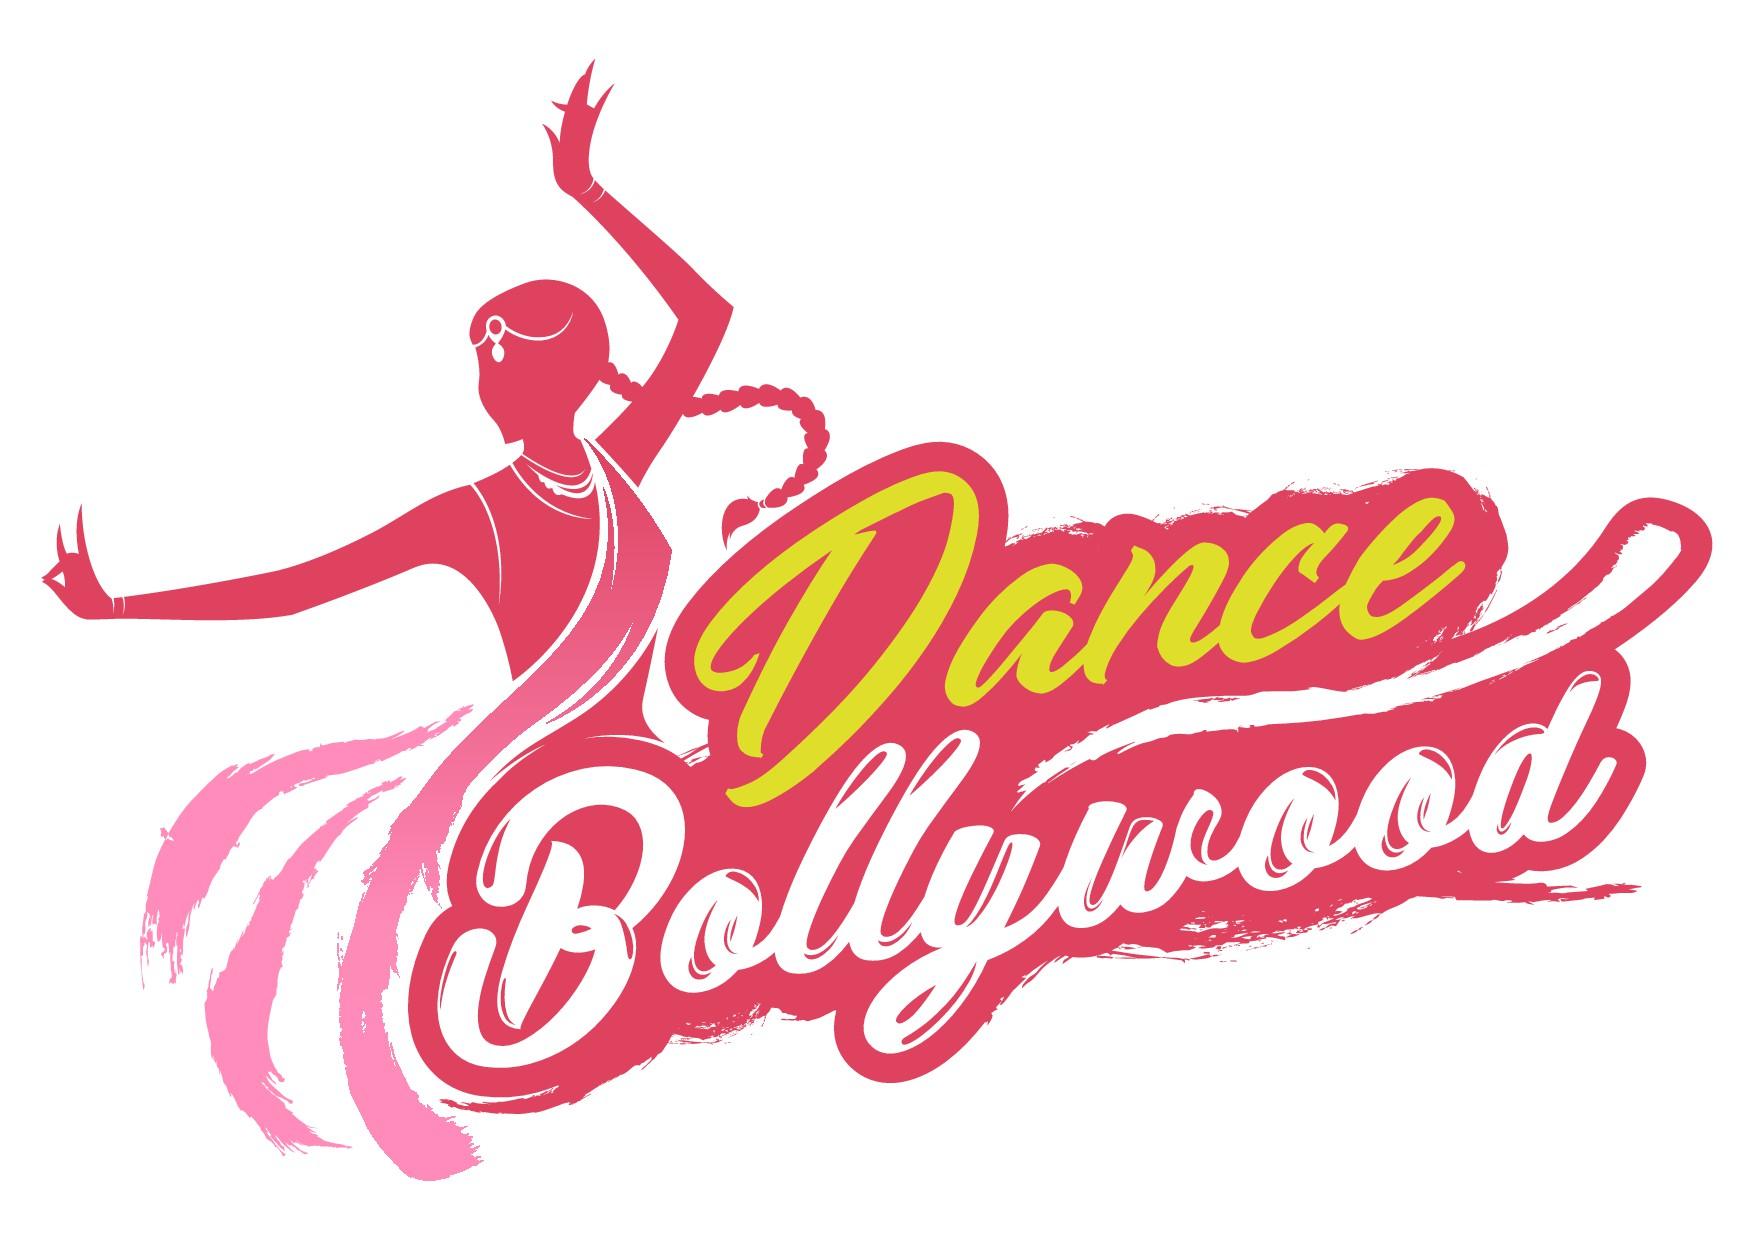 Dance school needs a fun vibrant logo